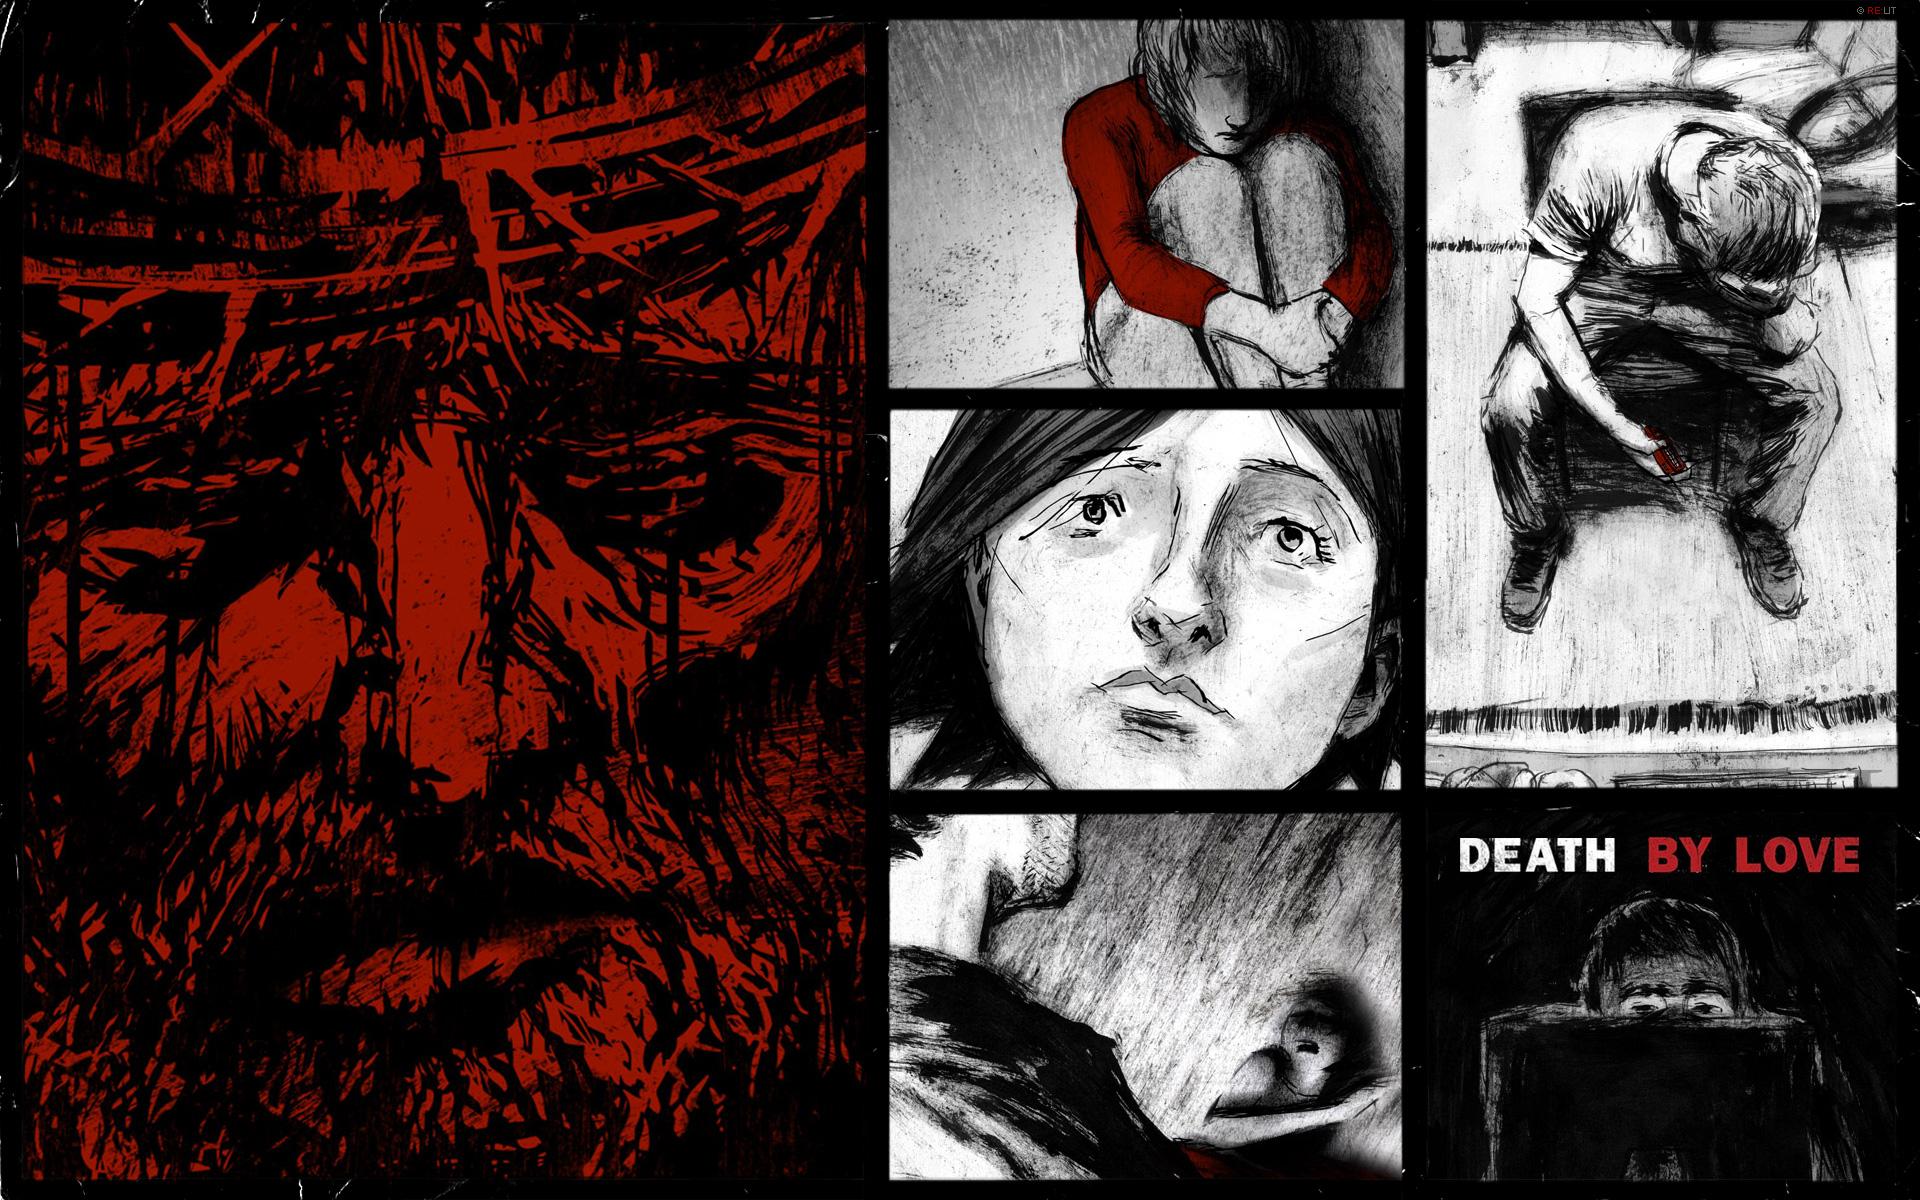 Love Death Wallpaper Download